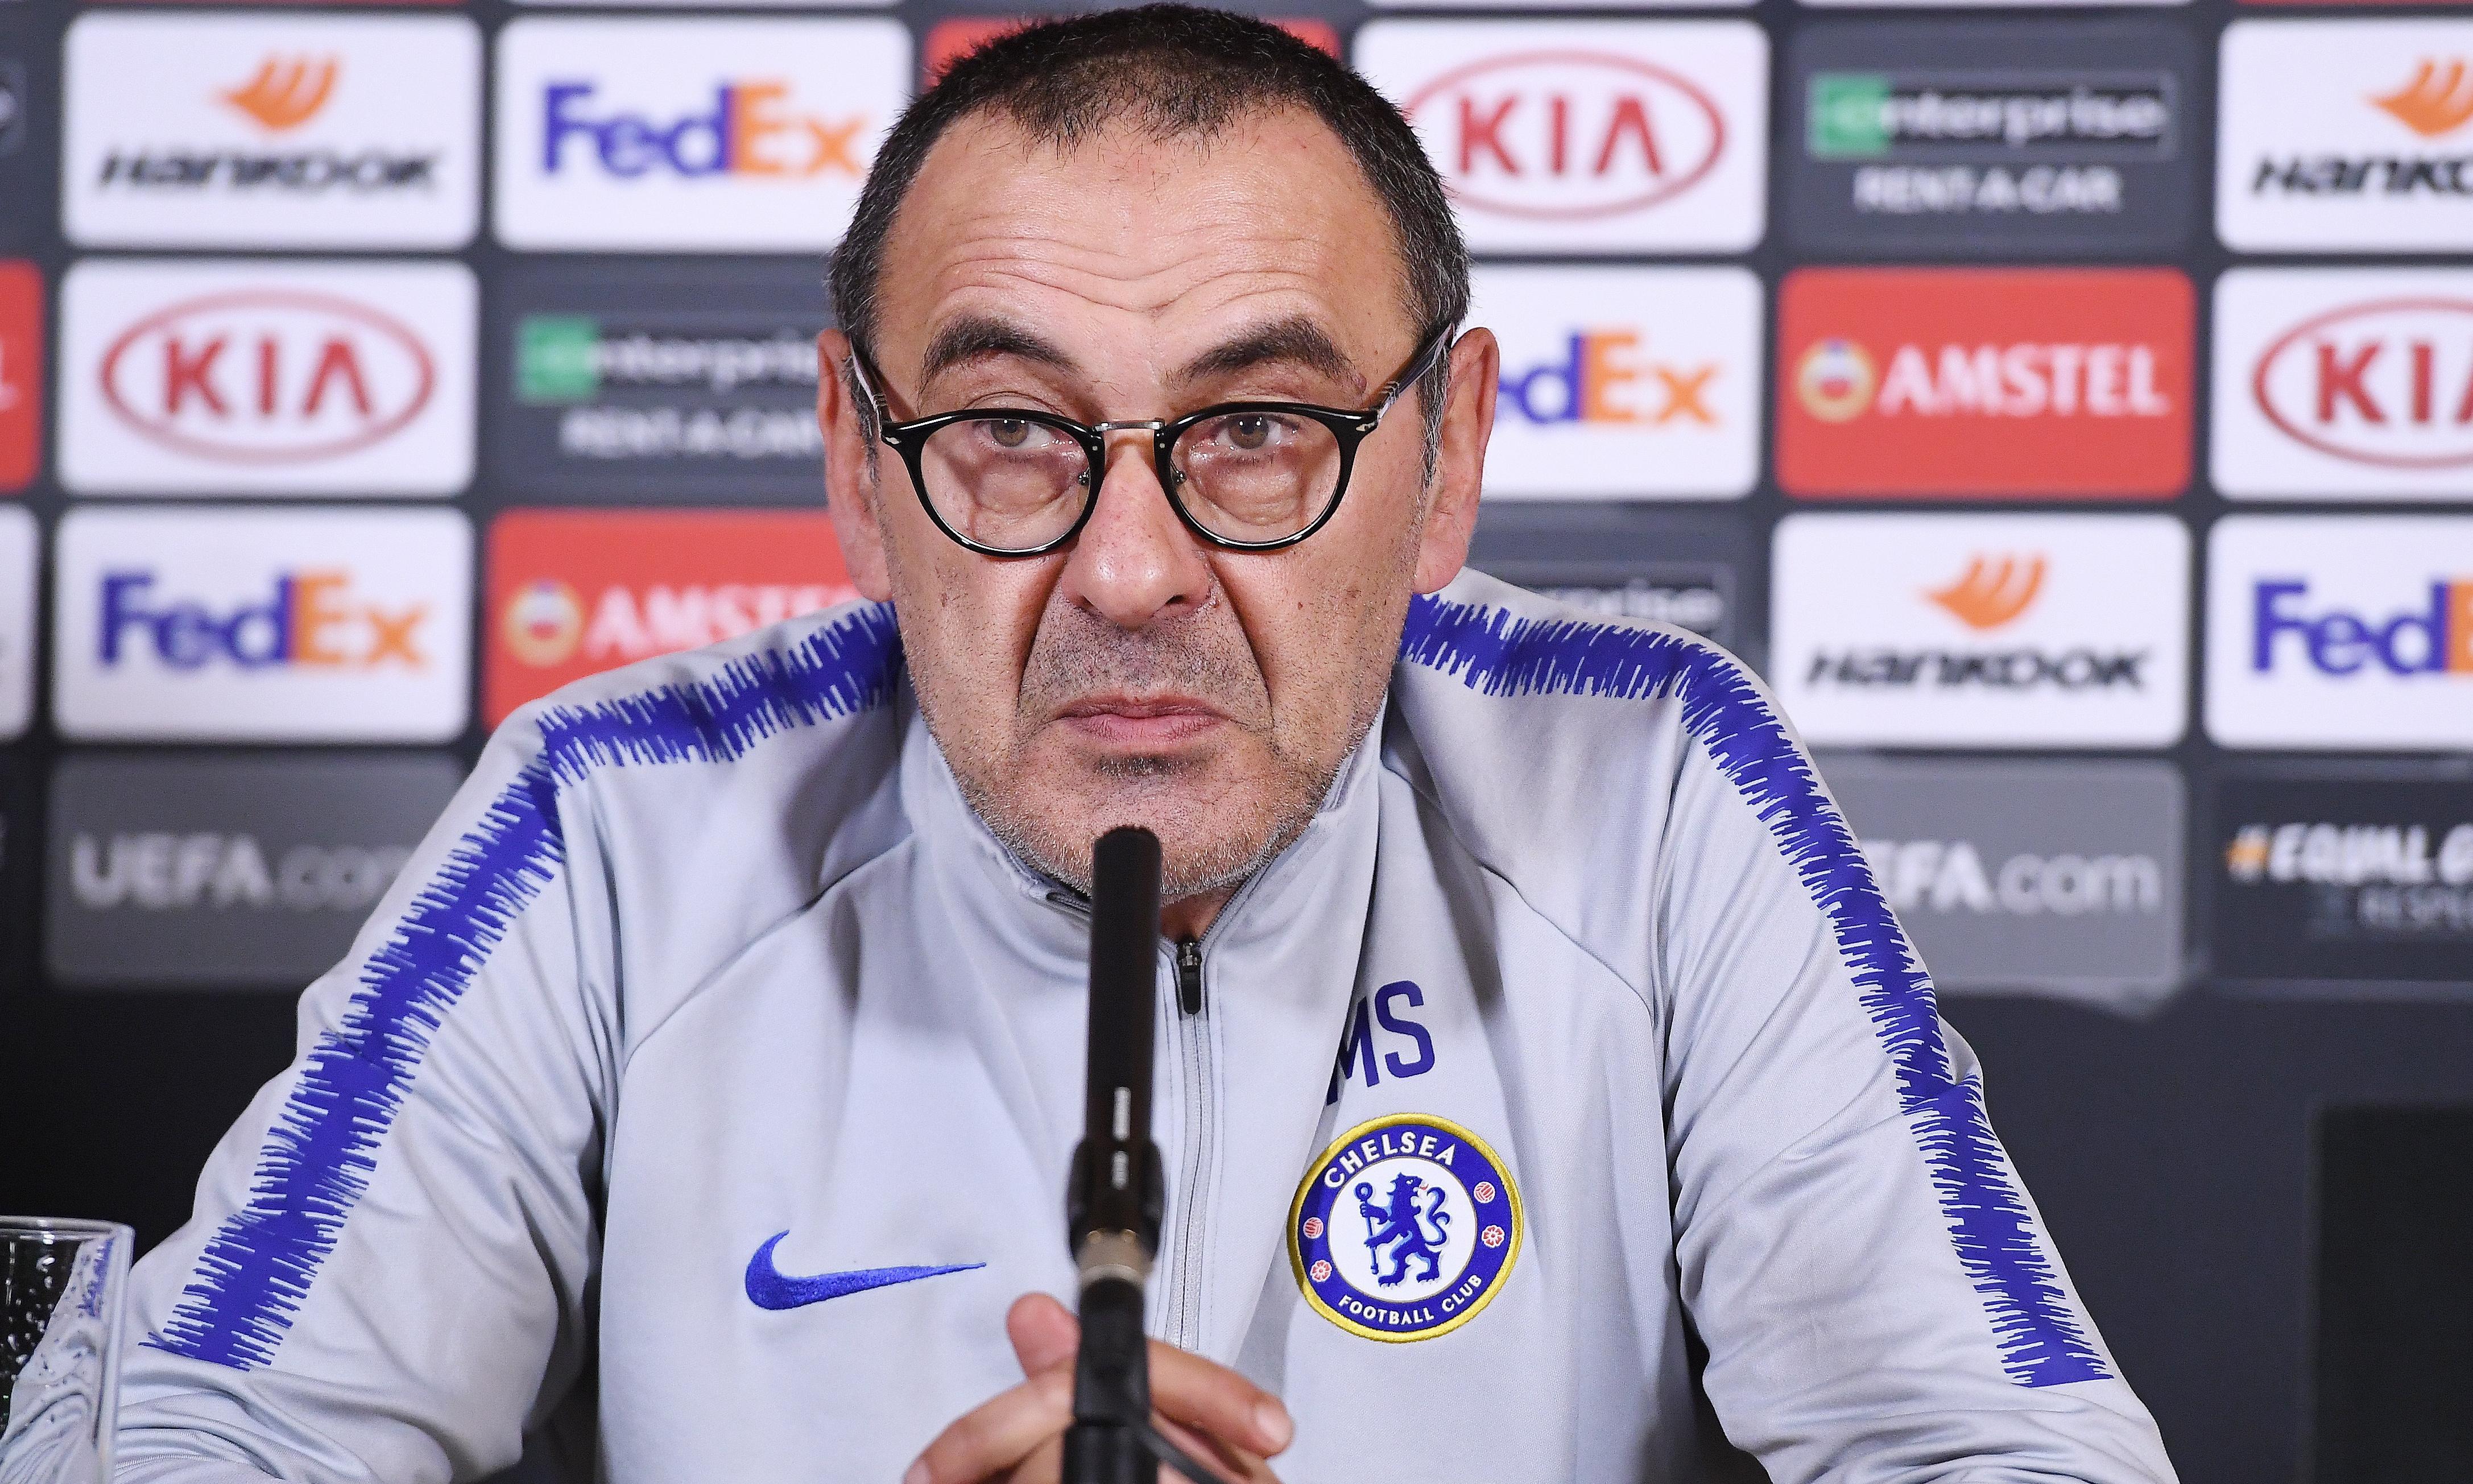 If my Chelsea future hinges on winning final, sack me now, says Maurizio Sarri